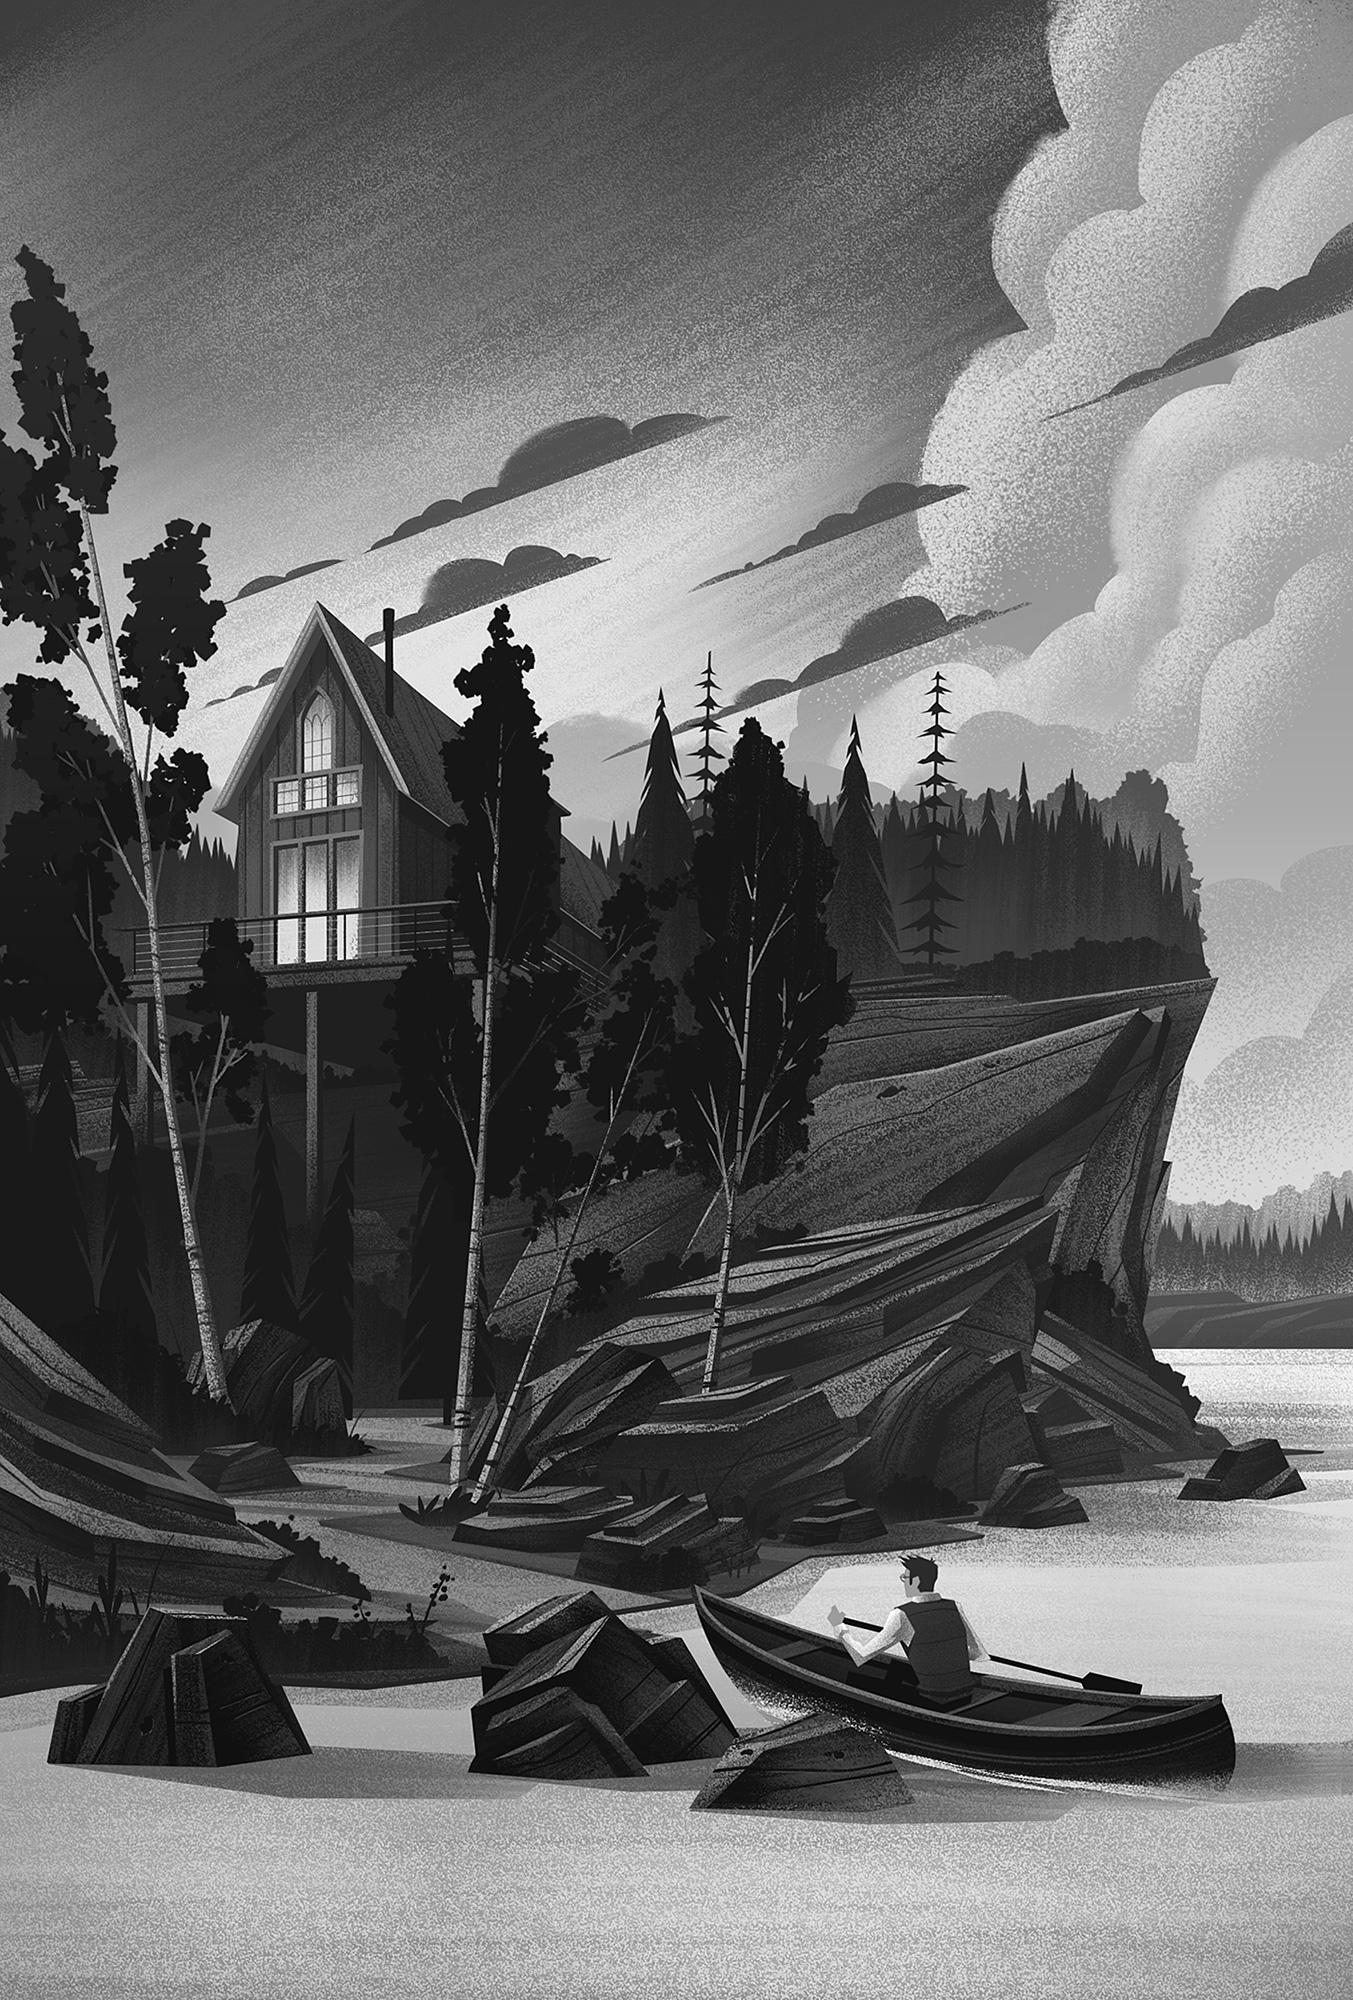 The Cabin · Black & White Values